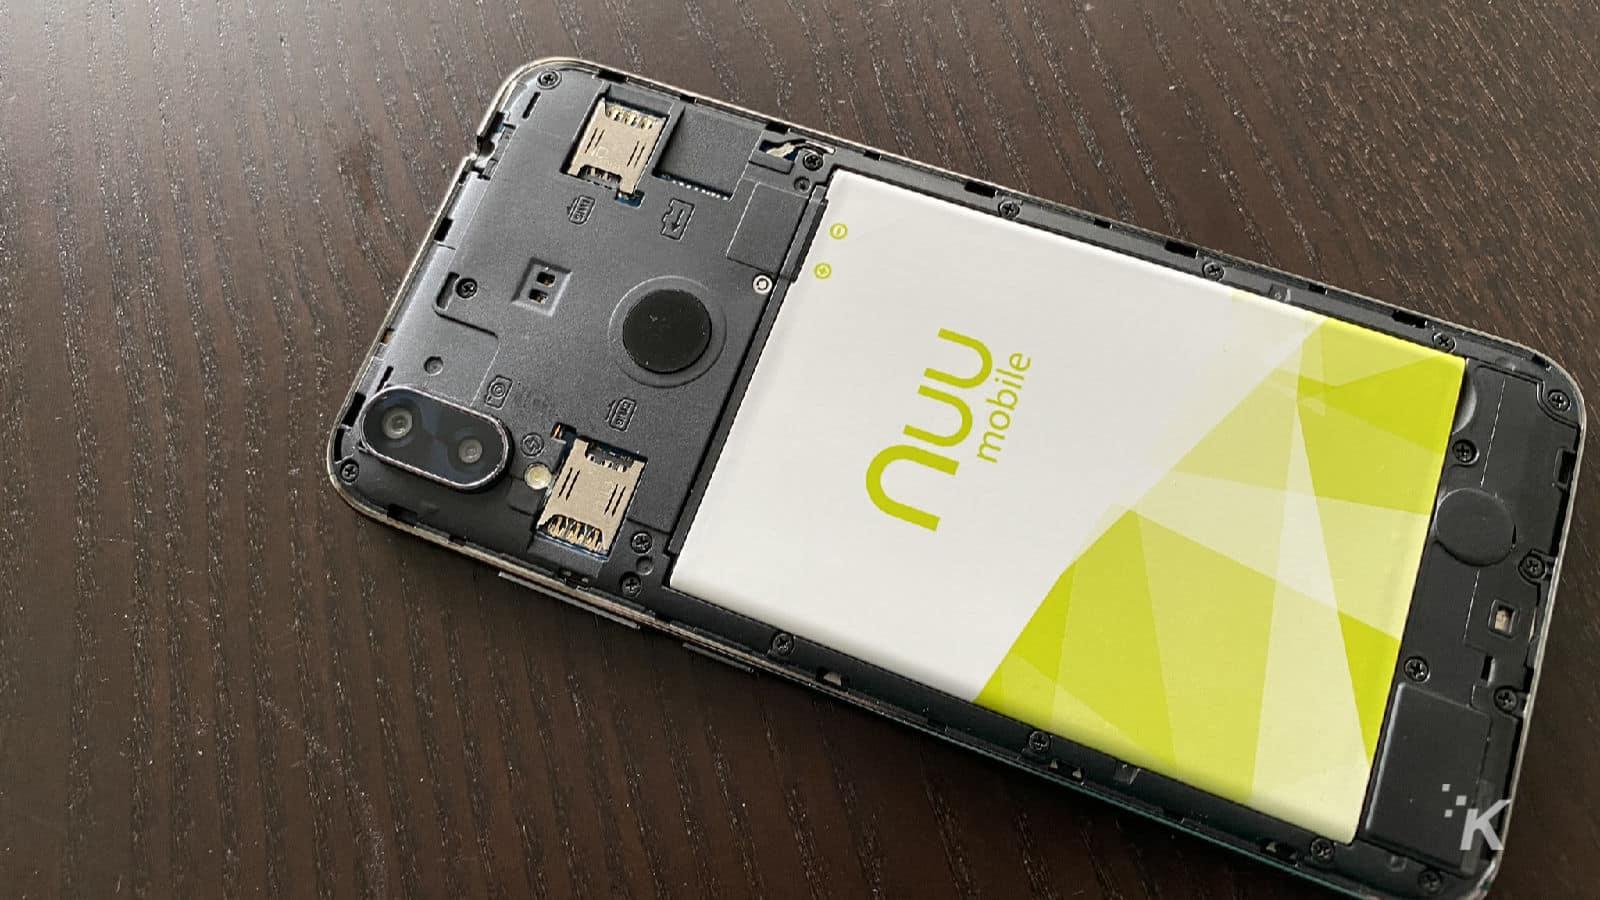 nuu mobile x8 smartphone on table